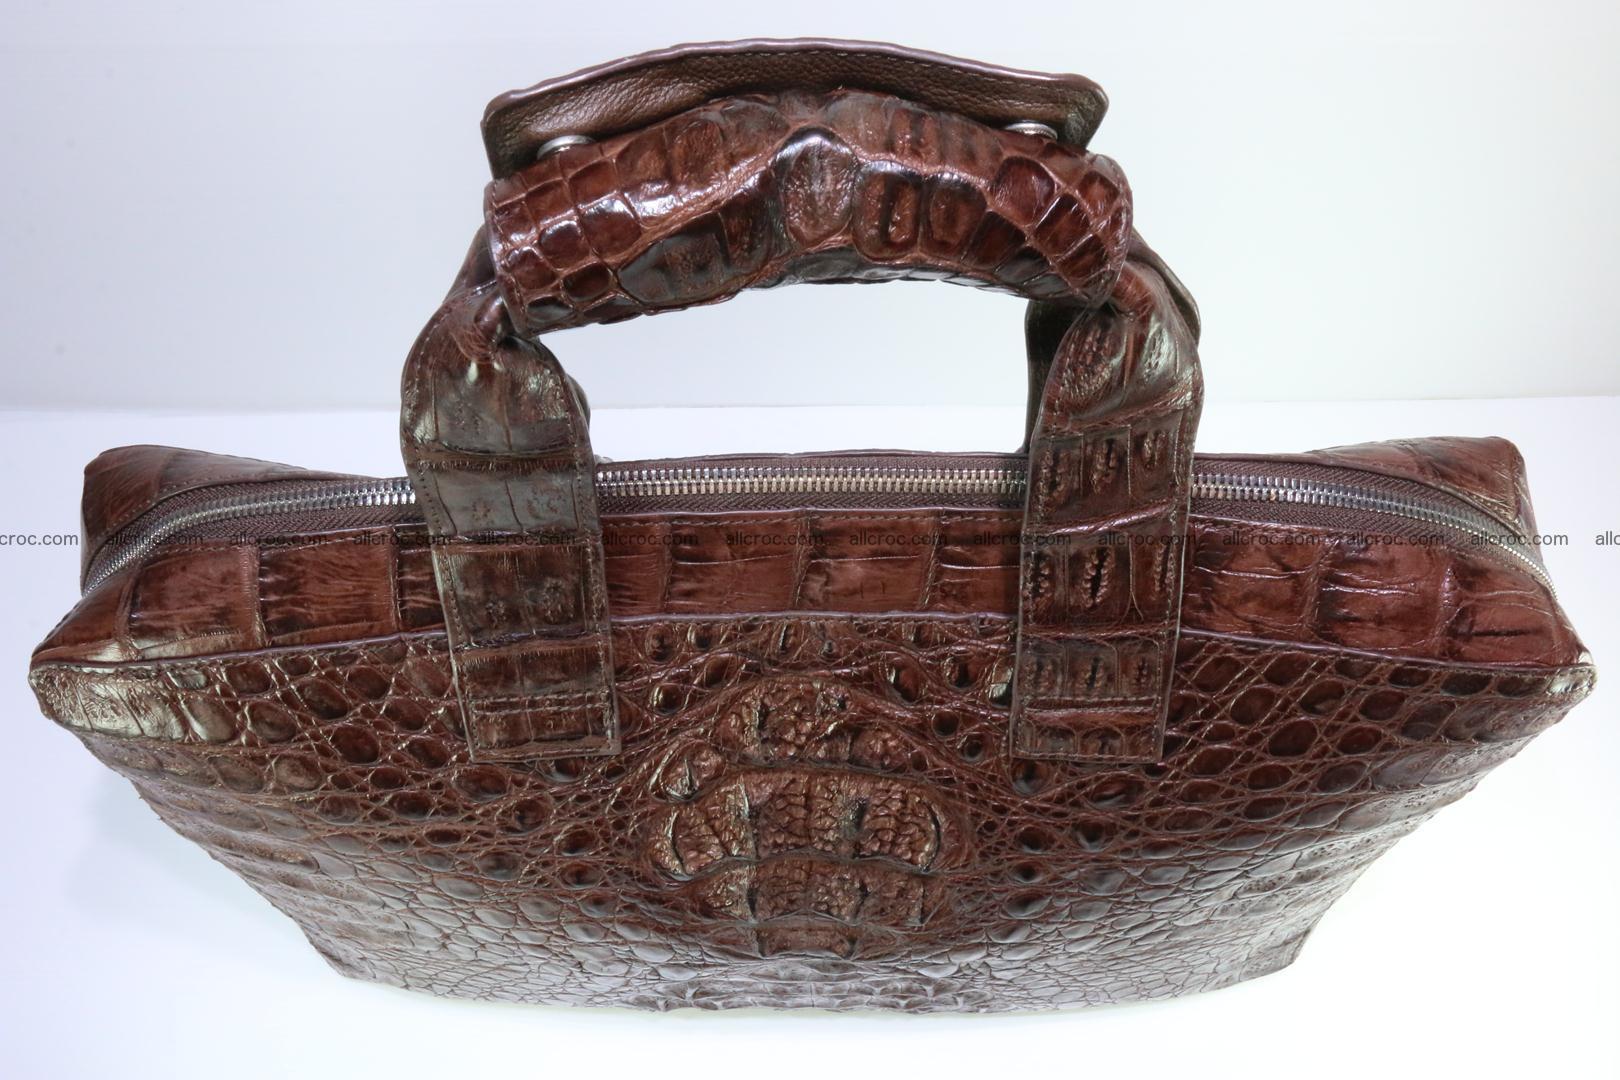 Crocodile skin handbag 126 Foto 9